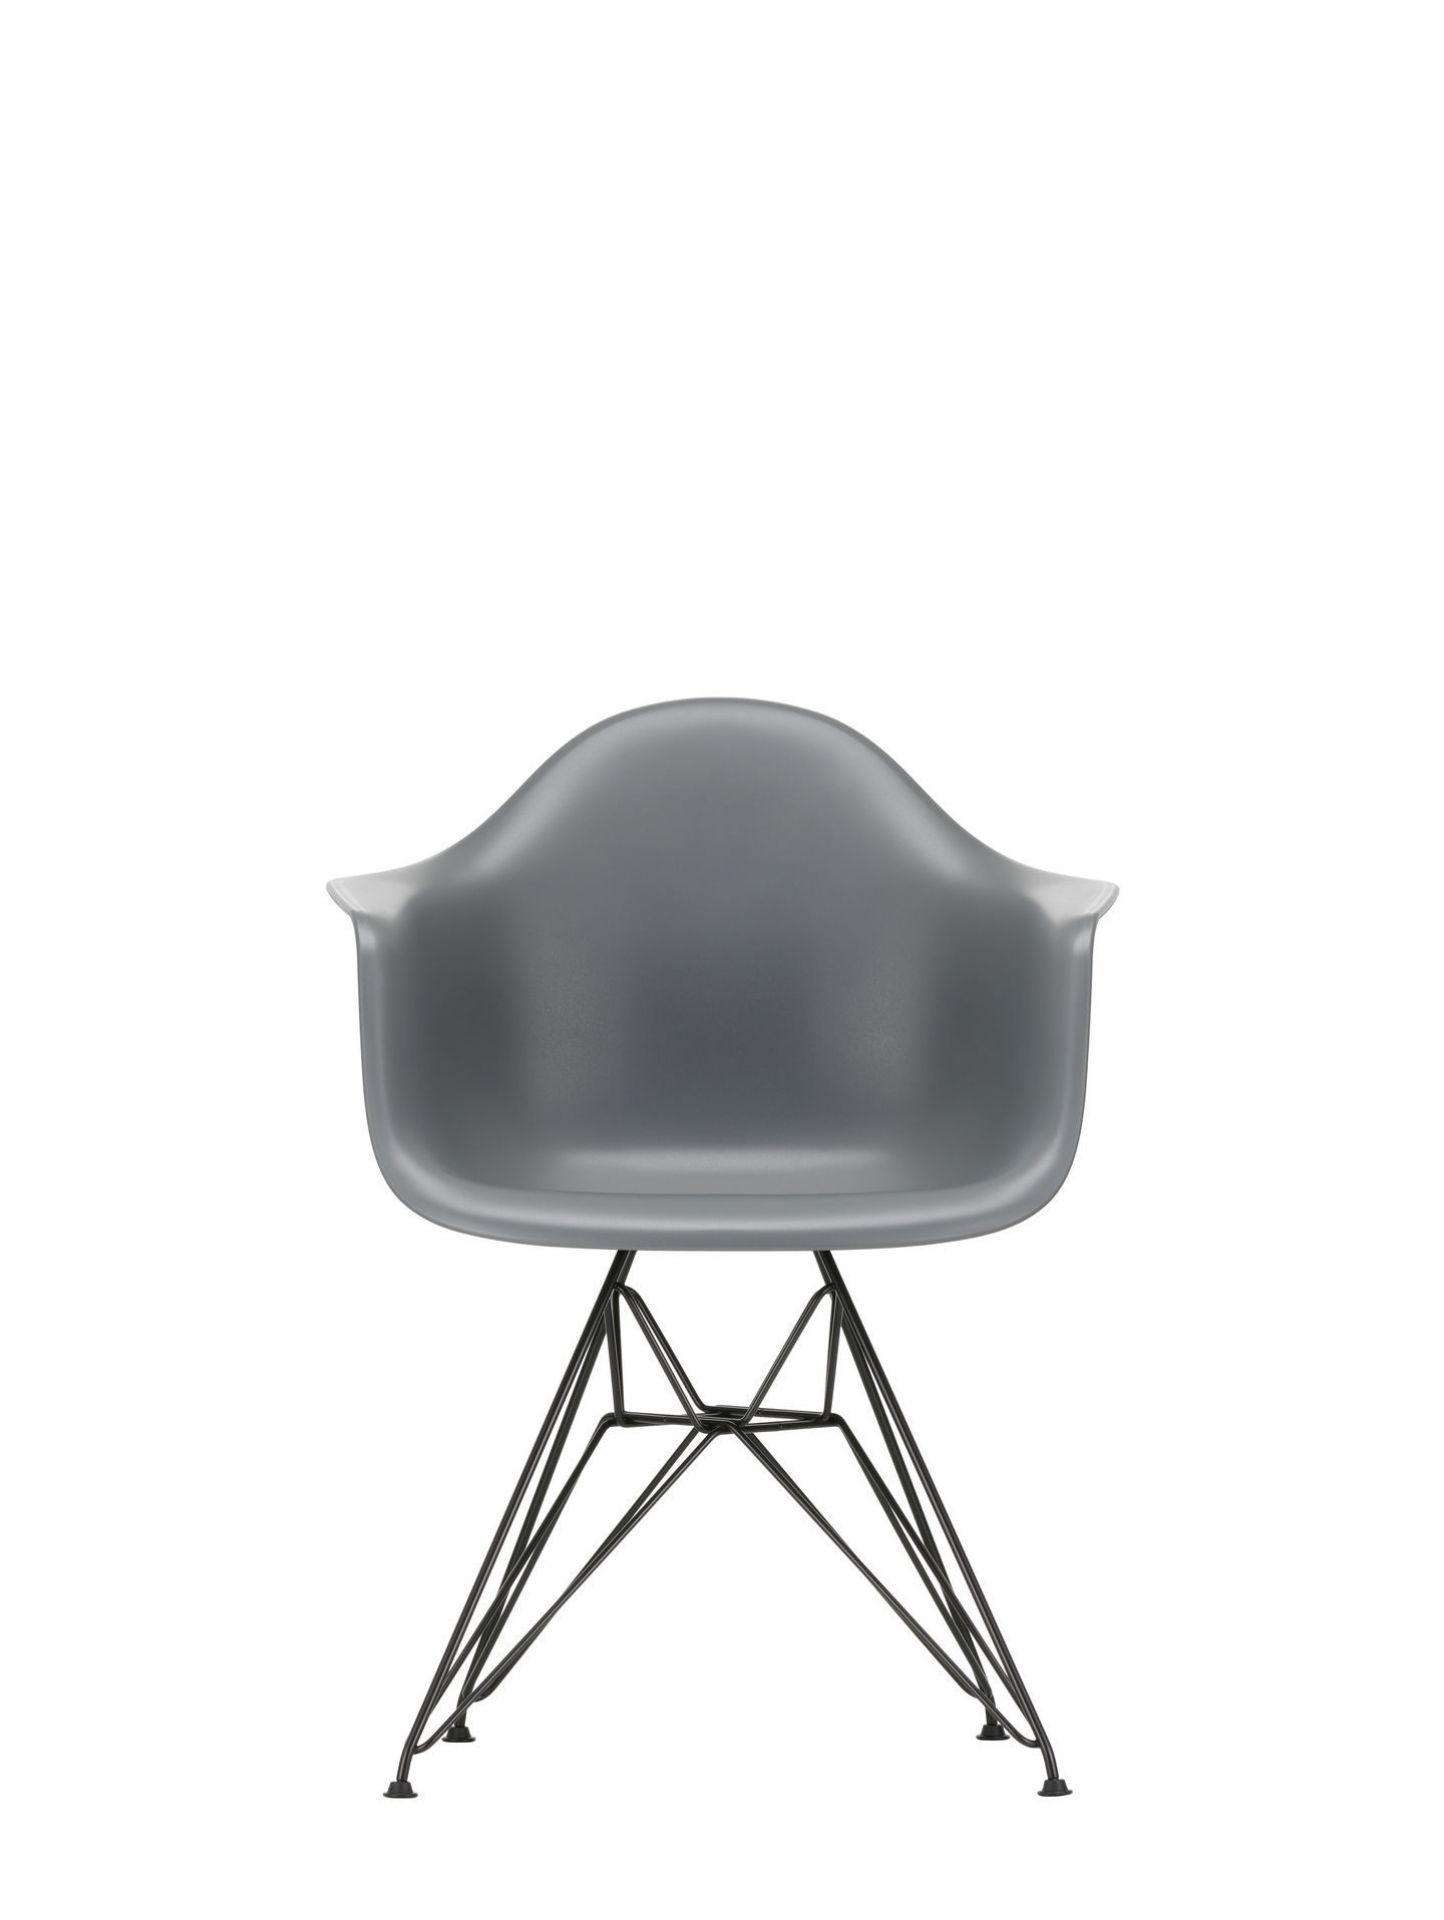 Eames Plastic Arm Chair DAR Stuhl Vitra